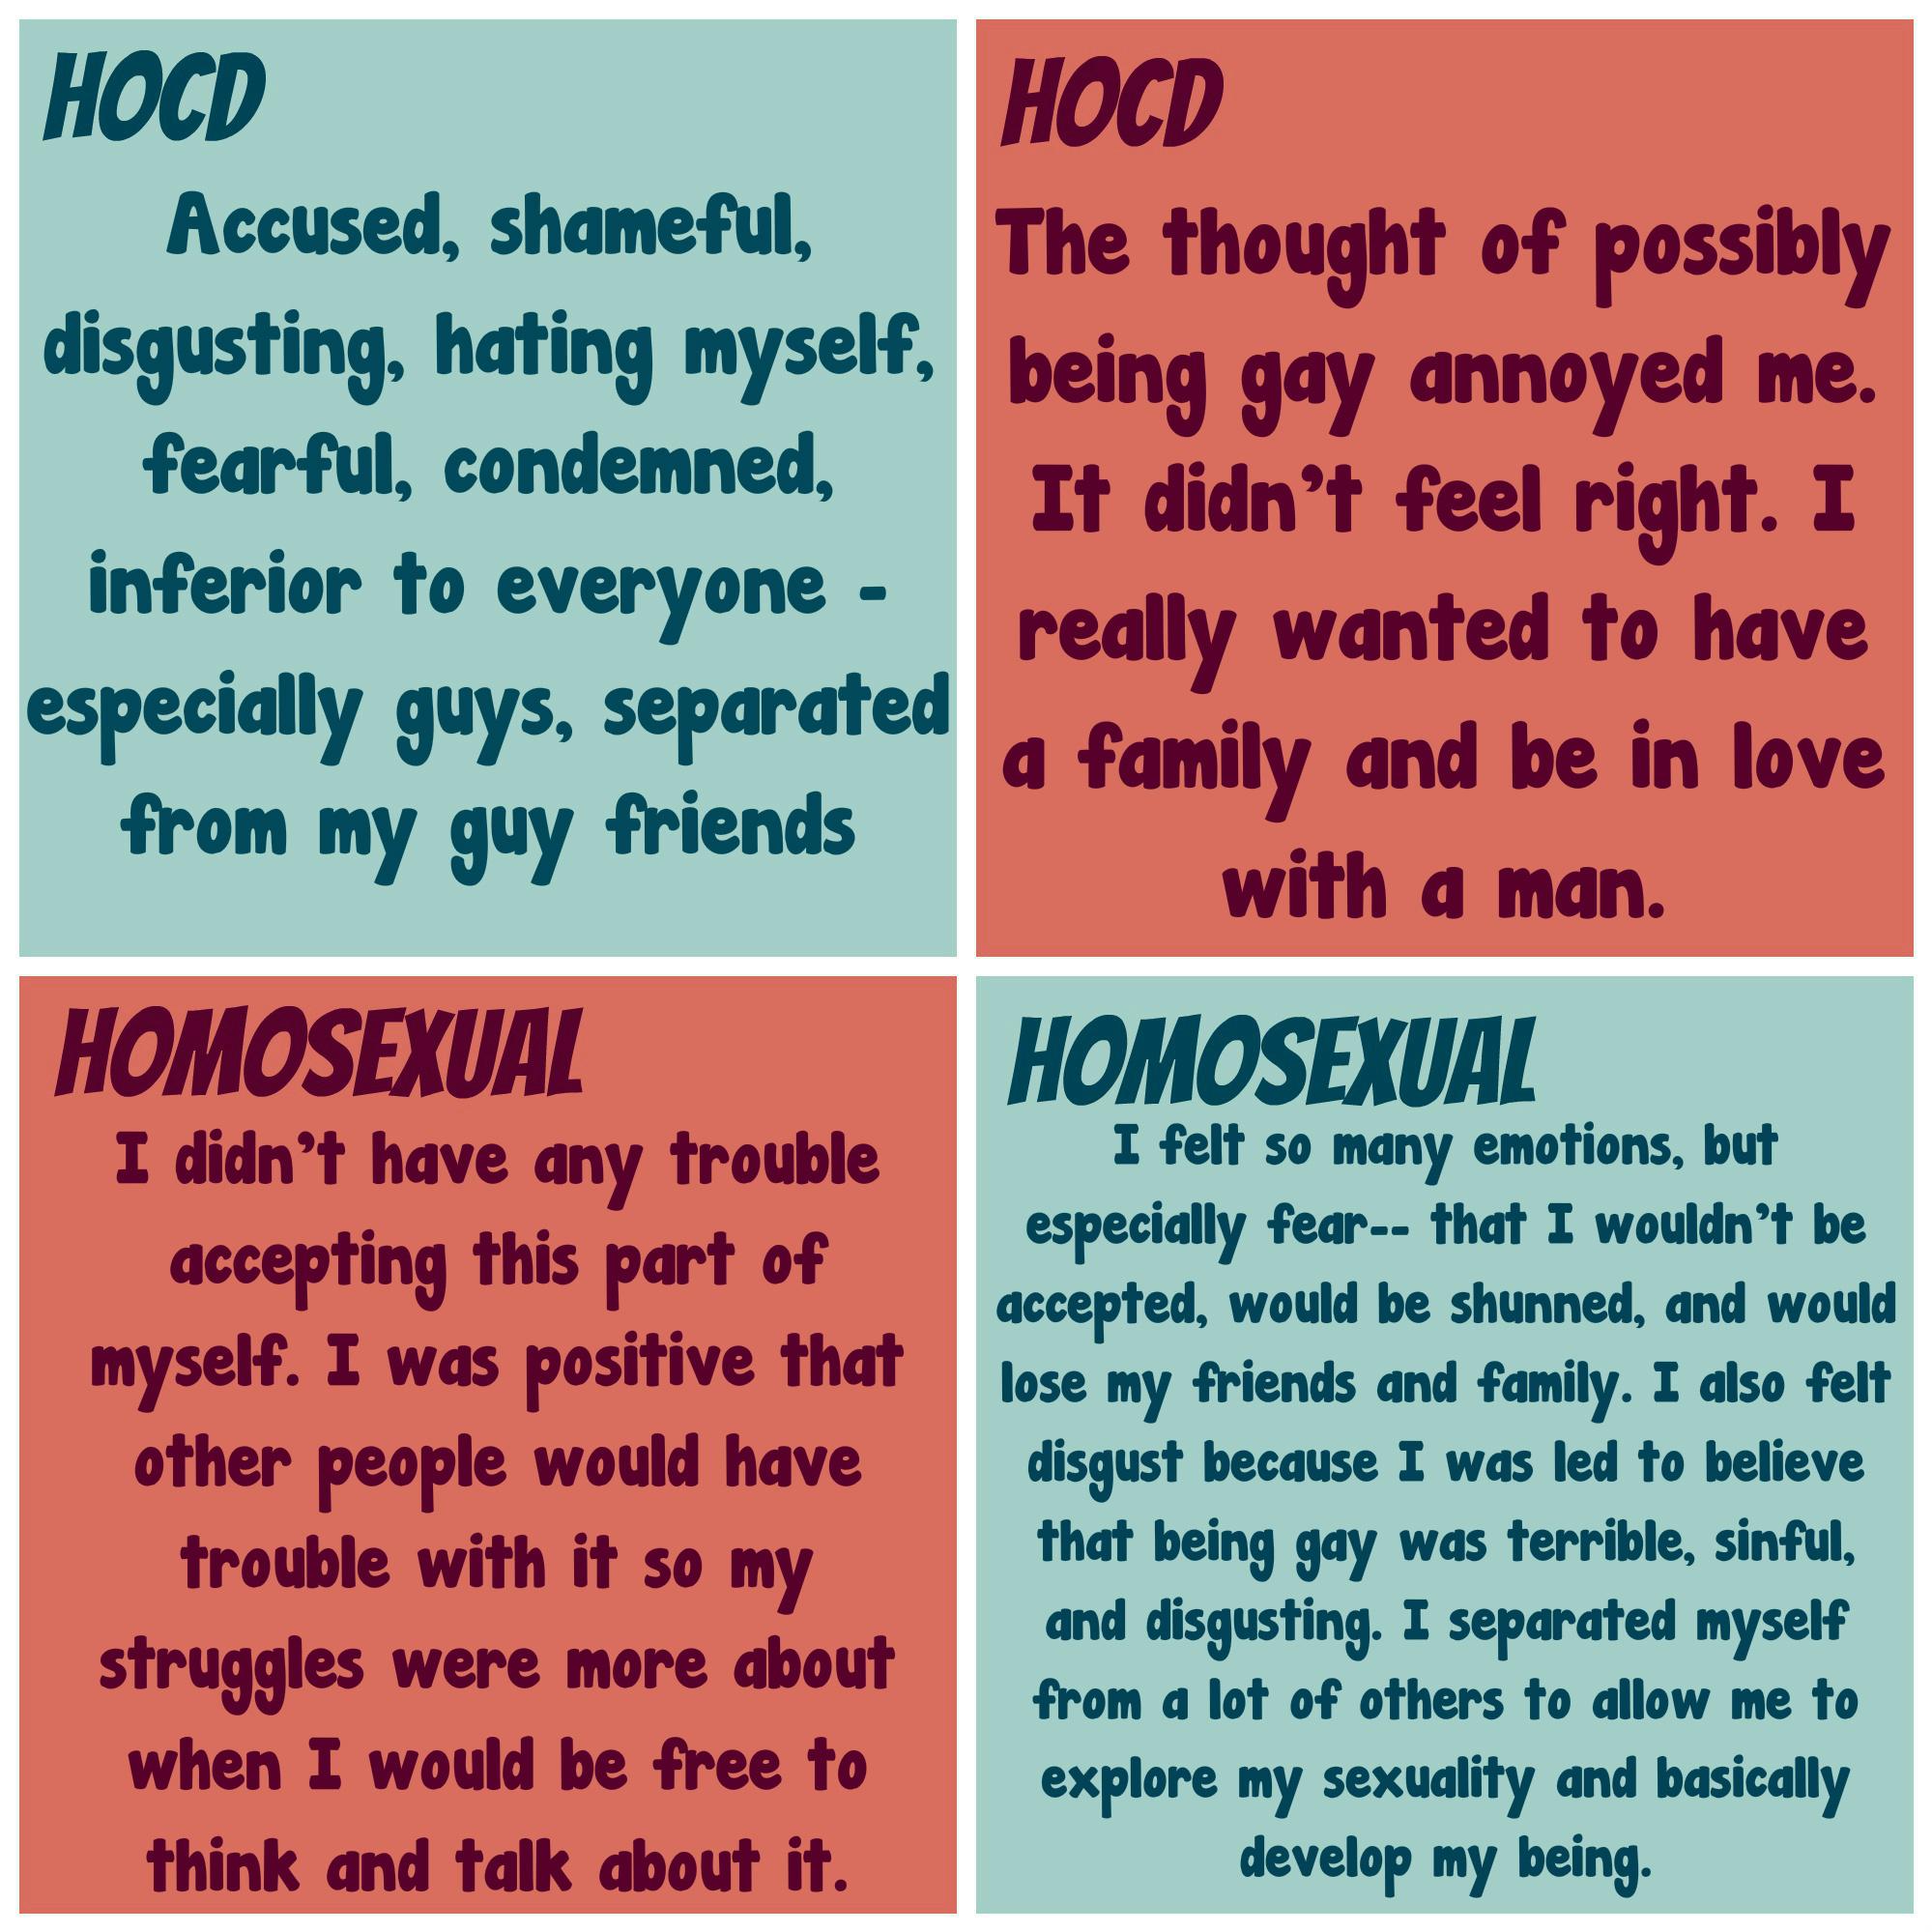 Gay denial symptoms